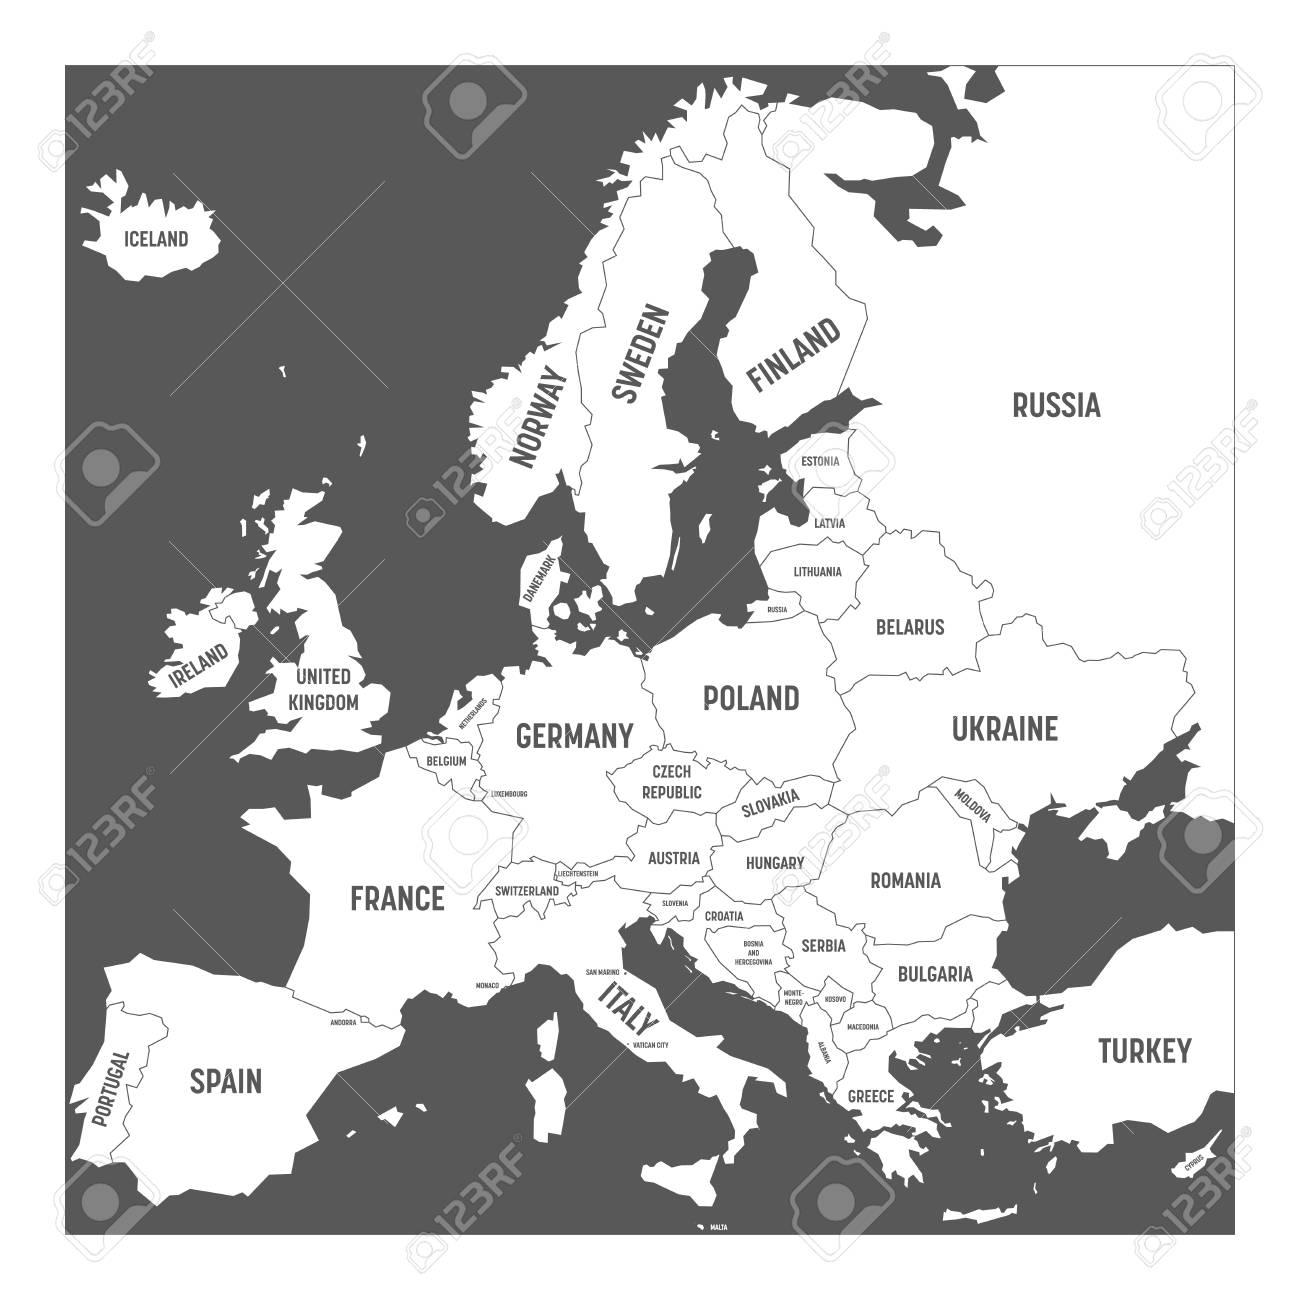 Mapa De Europa En Blanco Con Nombres.Mapa De Europa Con Nombres De Paises Soberanos Ministatos Incluidos Mapa Blanco Simplificado Del Vector En Fondo Gris